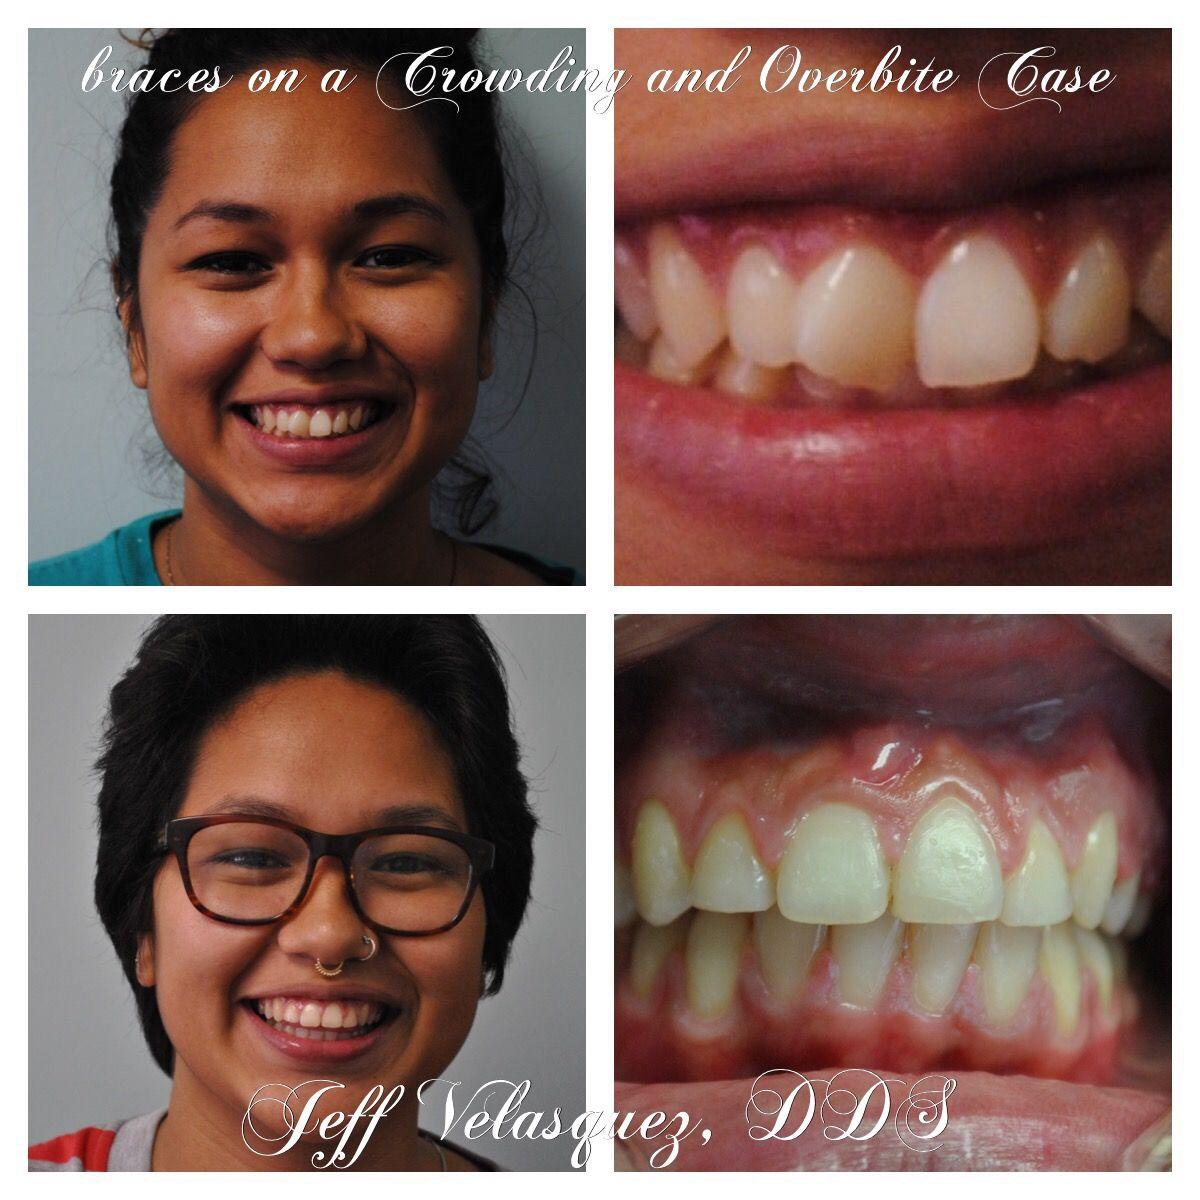 Carmina's Ortho Case, Dental braces or teeth braces for